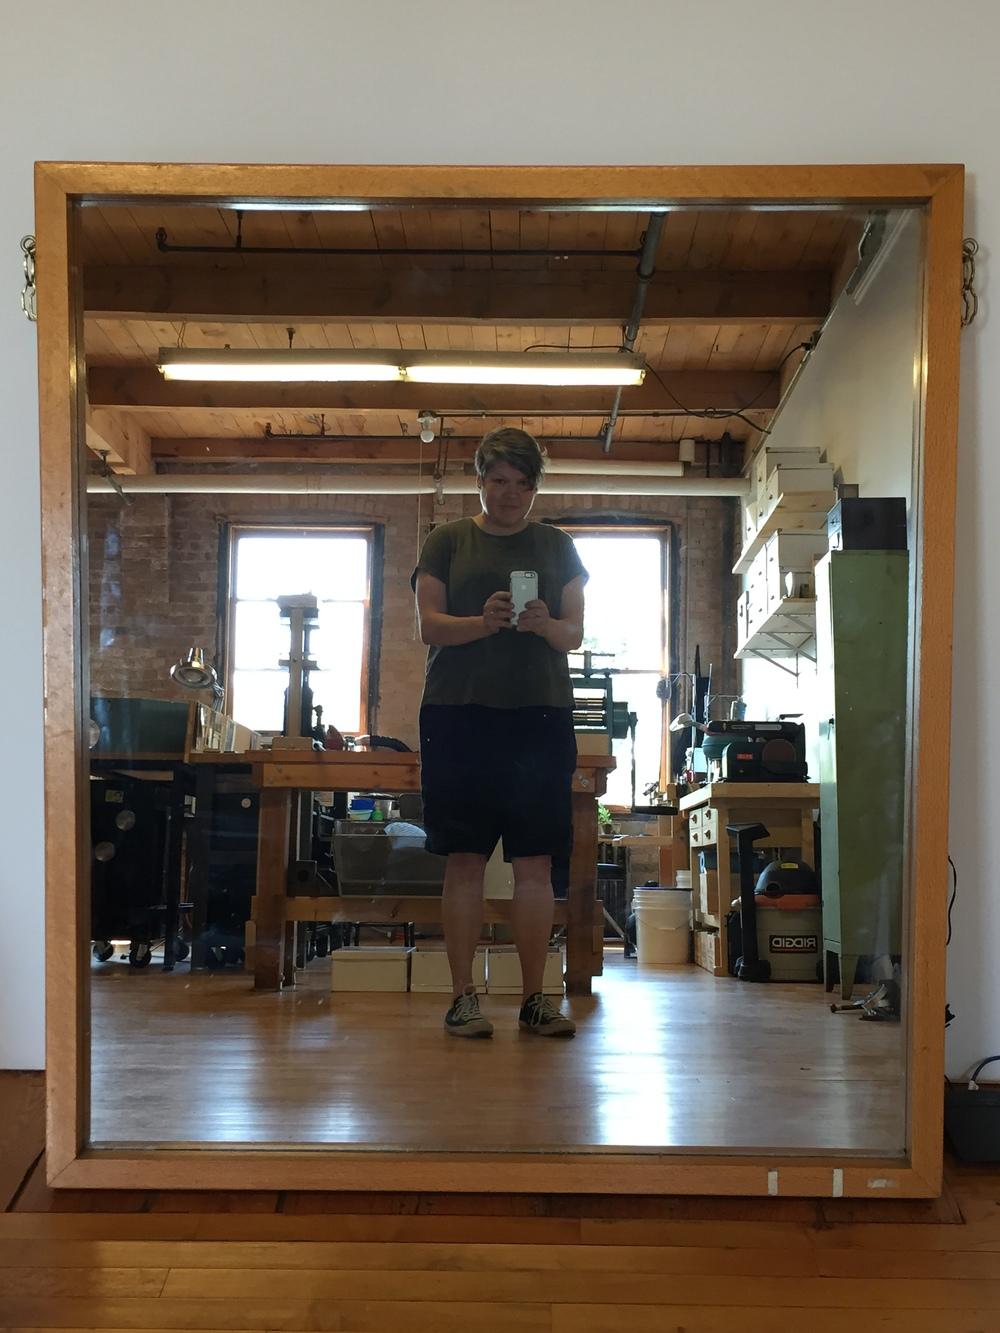 stick leg selfie